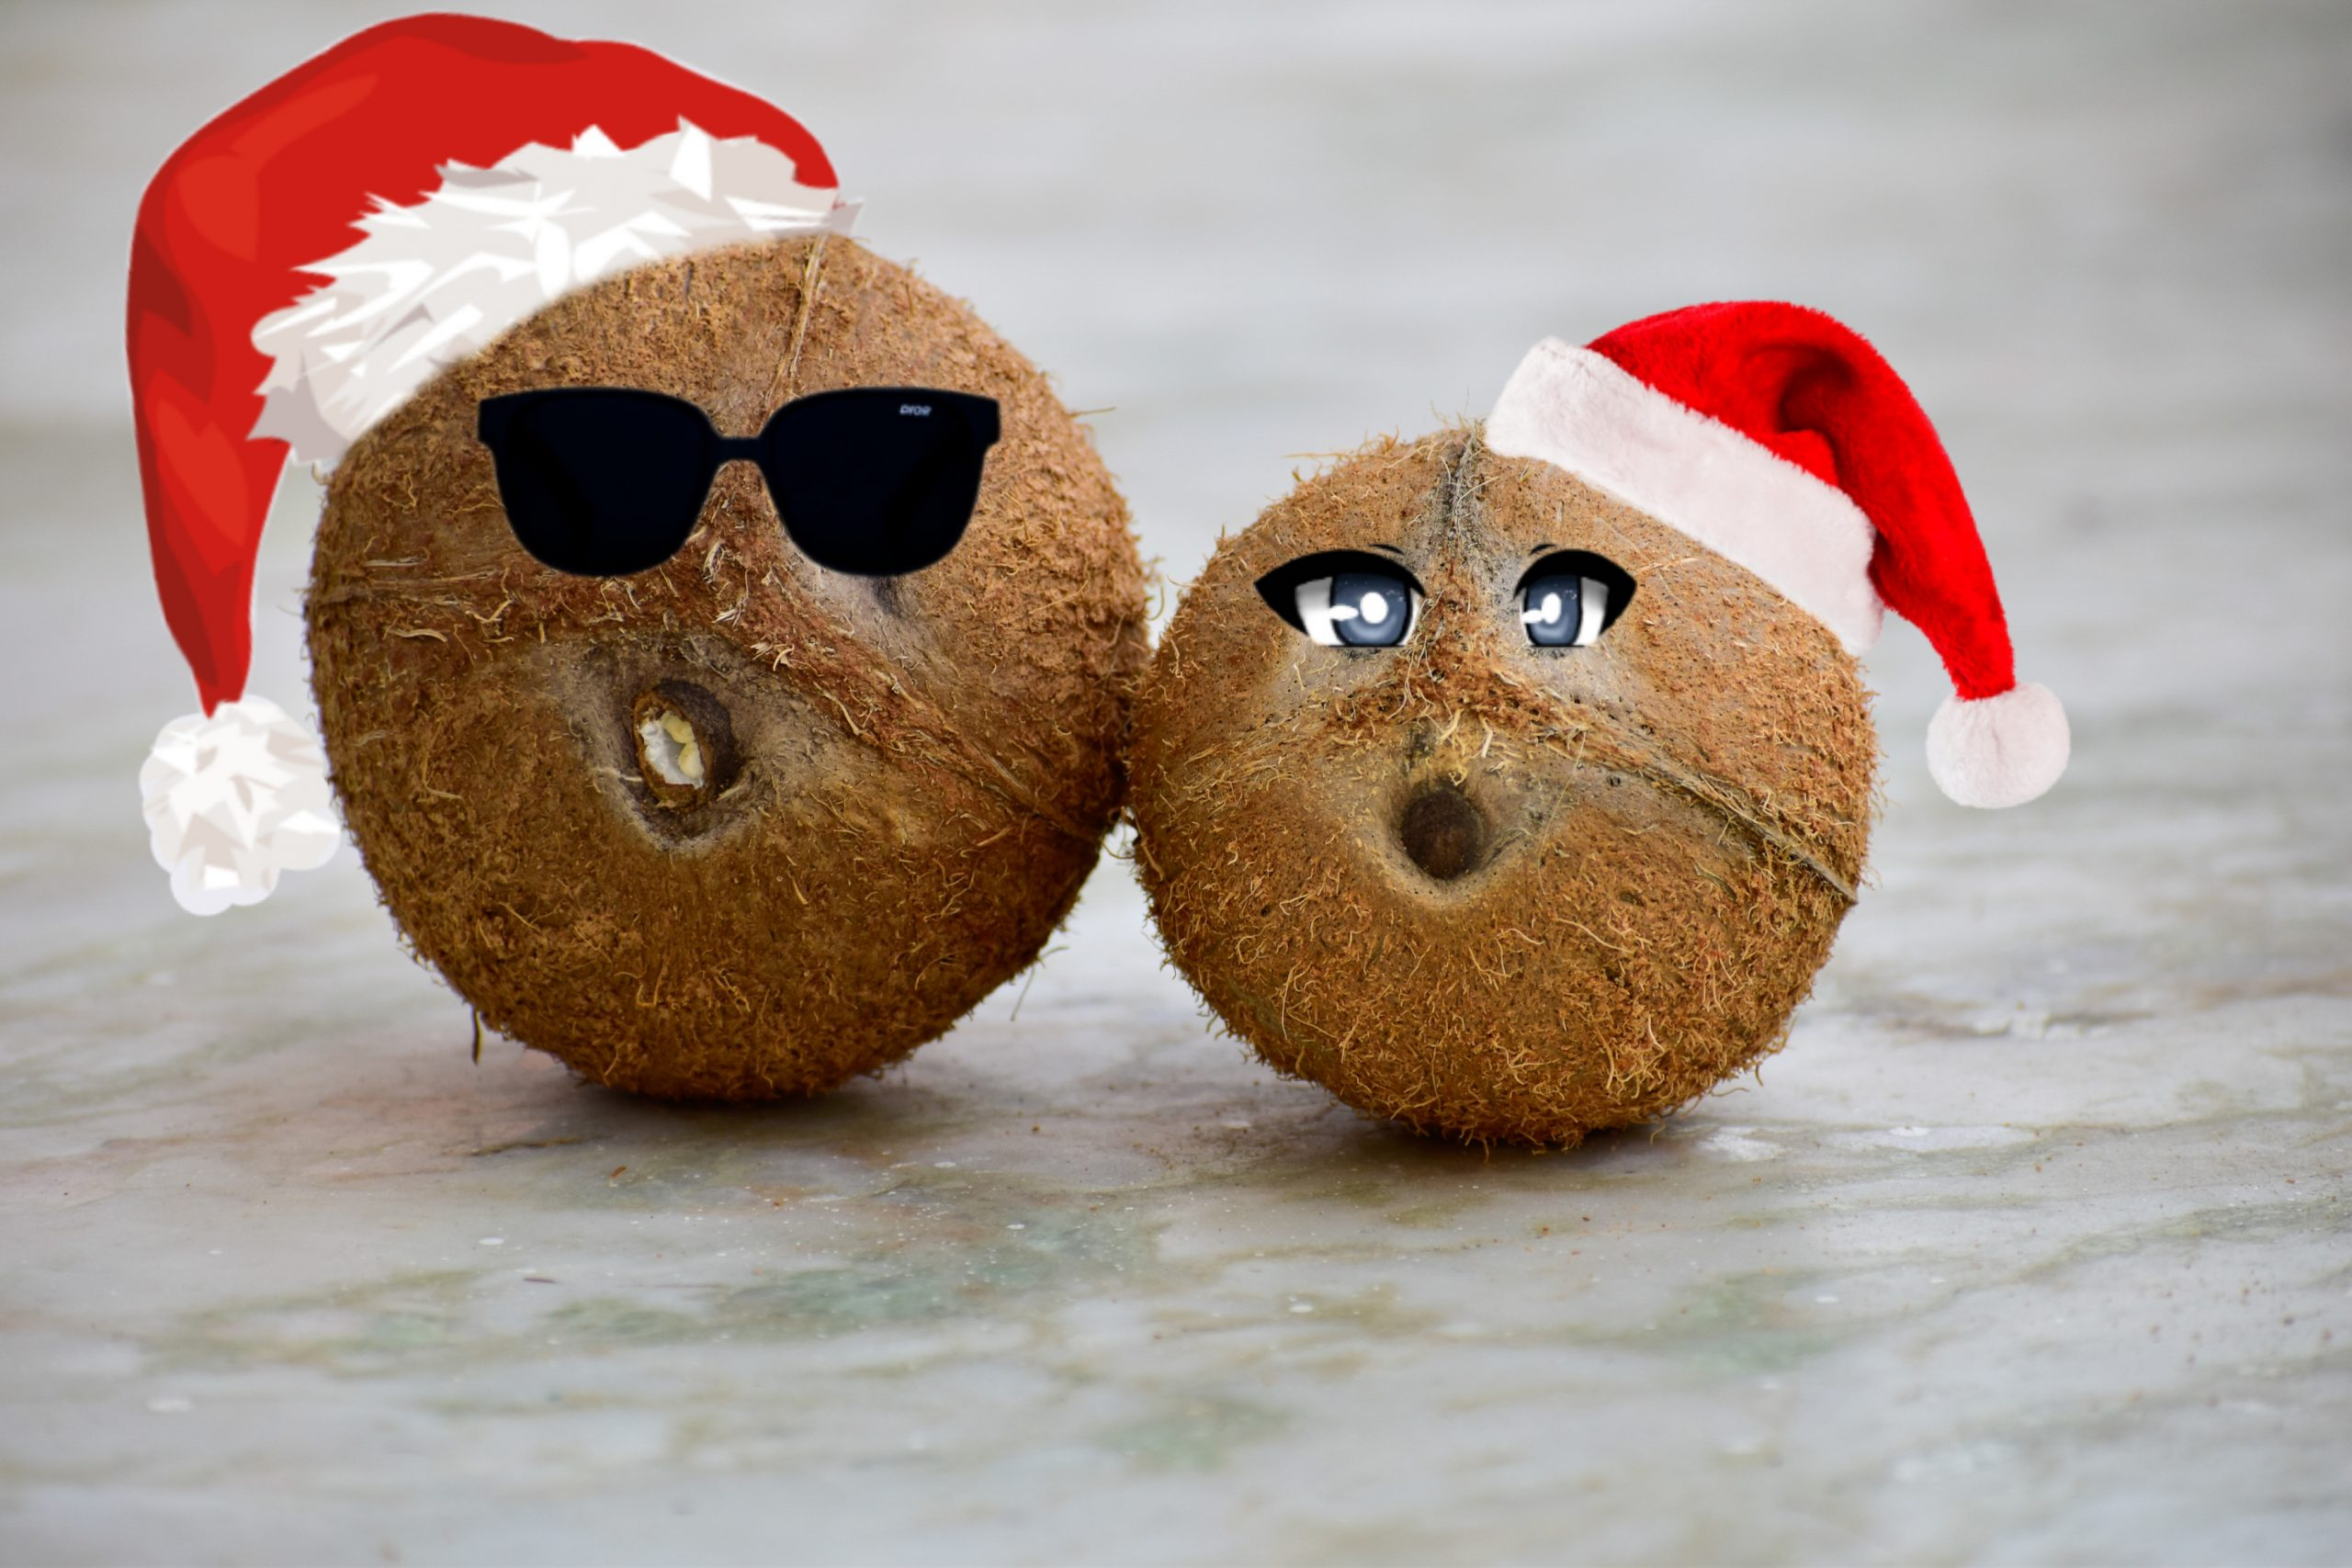 santa cap on coconut fruit